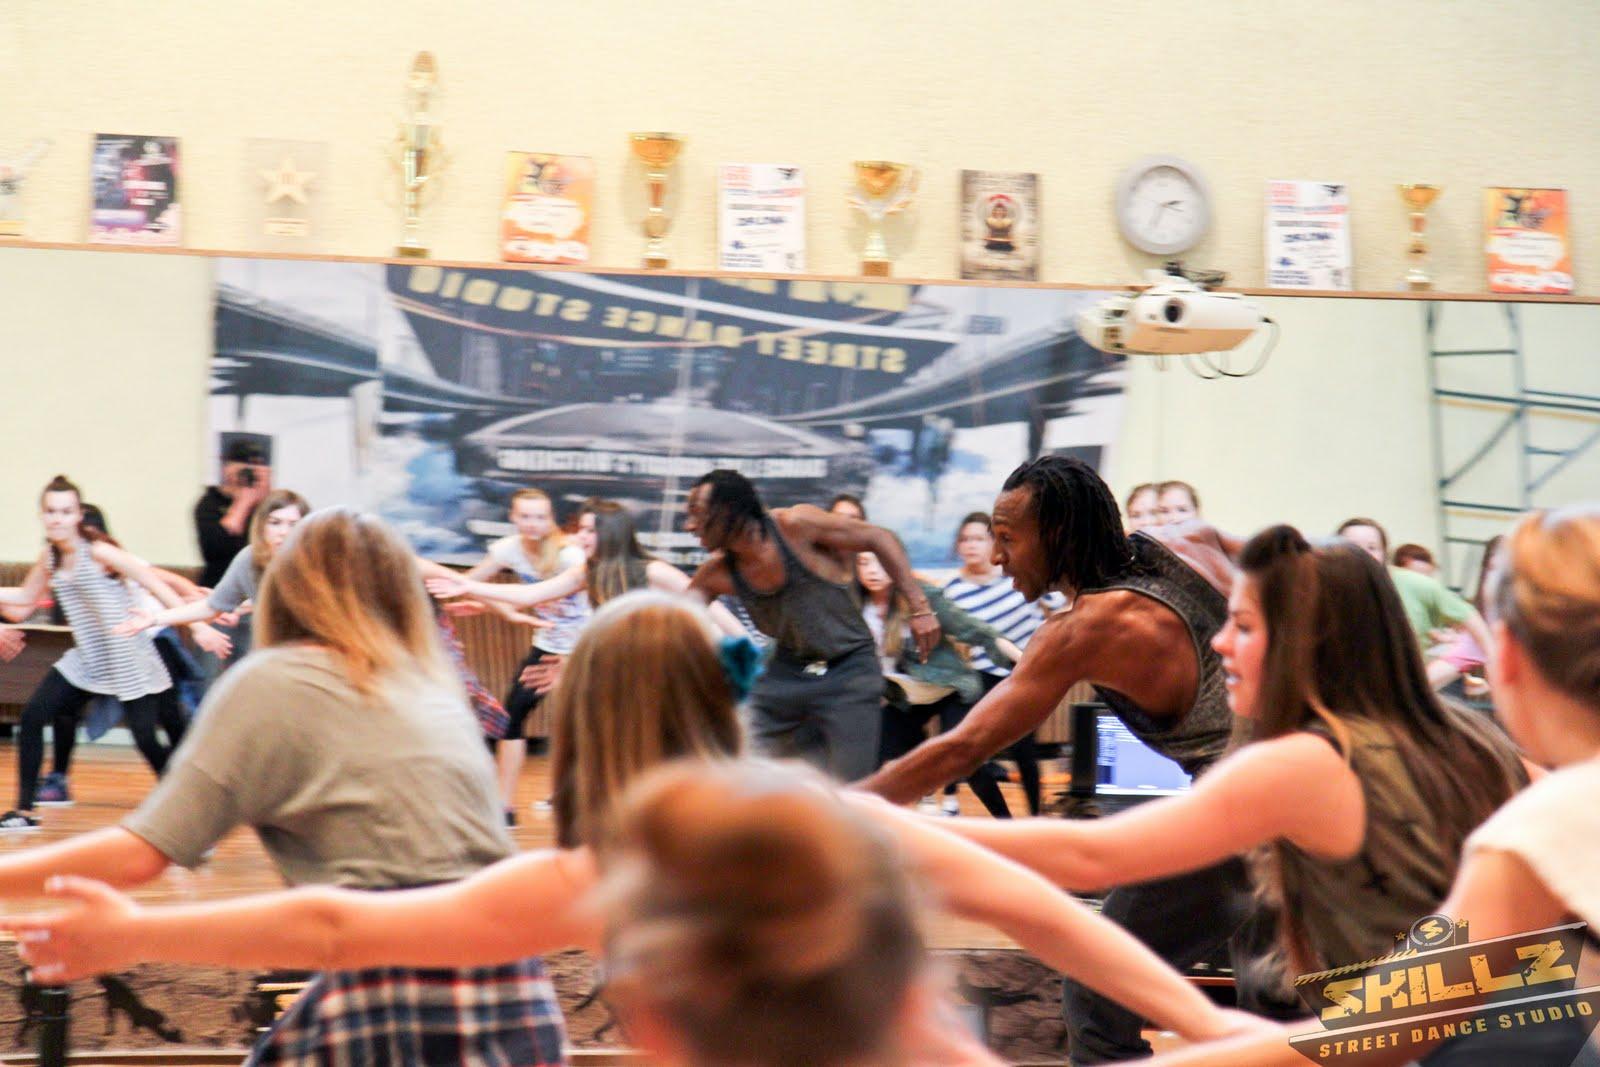 Dancehall workshop with Camron One Shot - IMG_7739.jpg